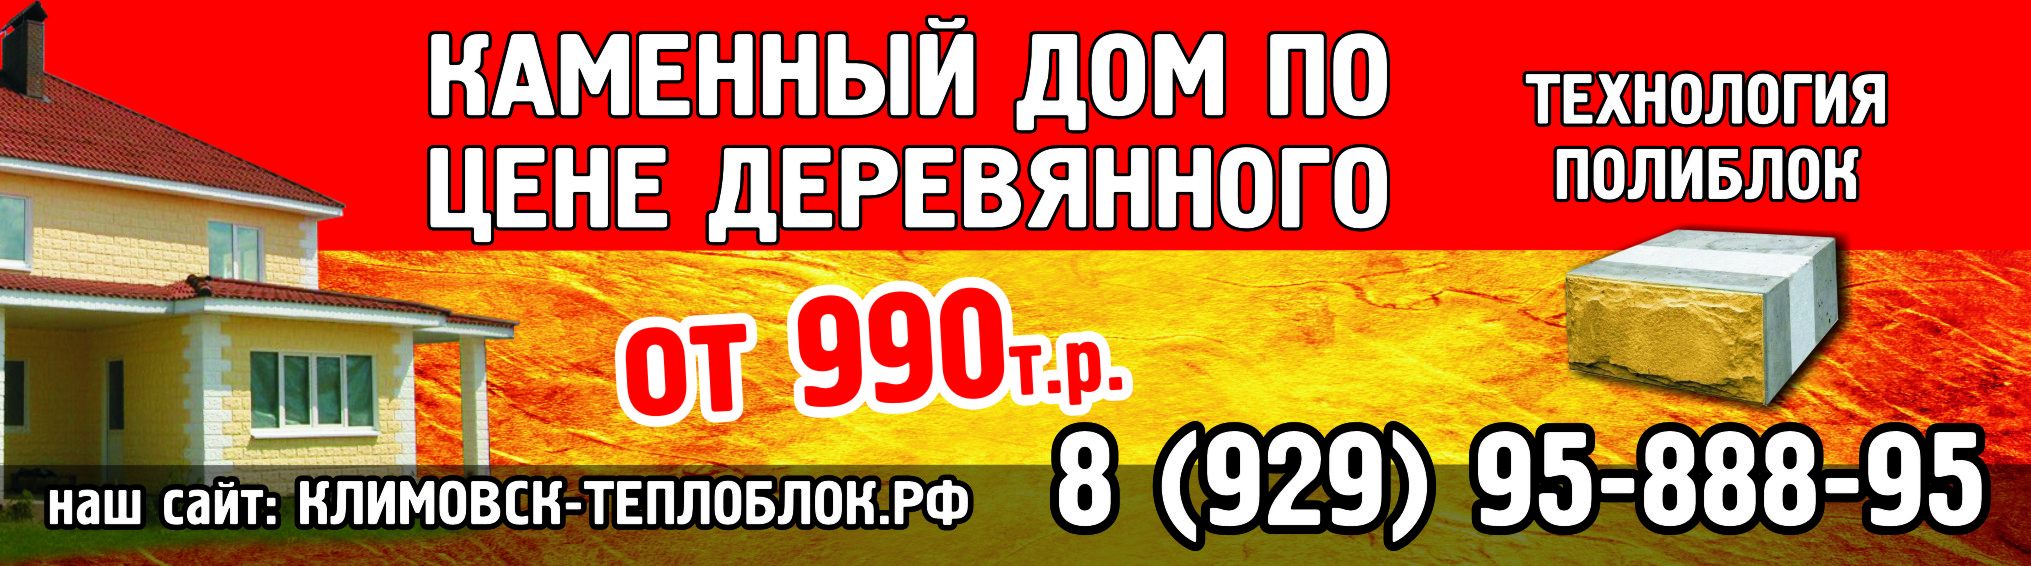 Климовский теплоблок podolsk